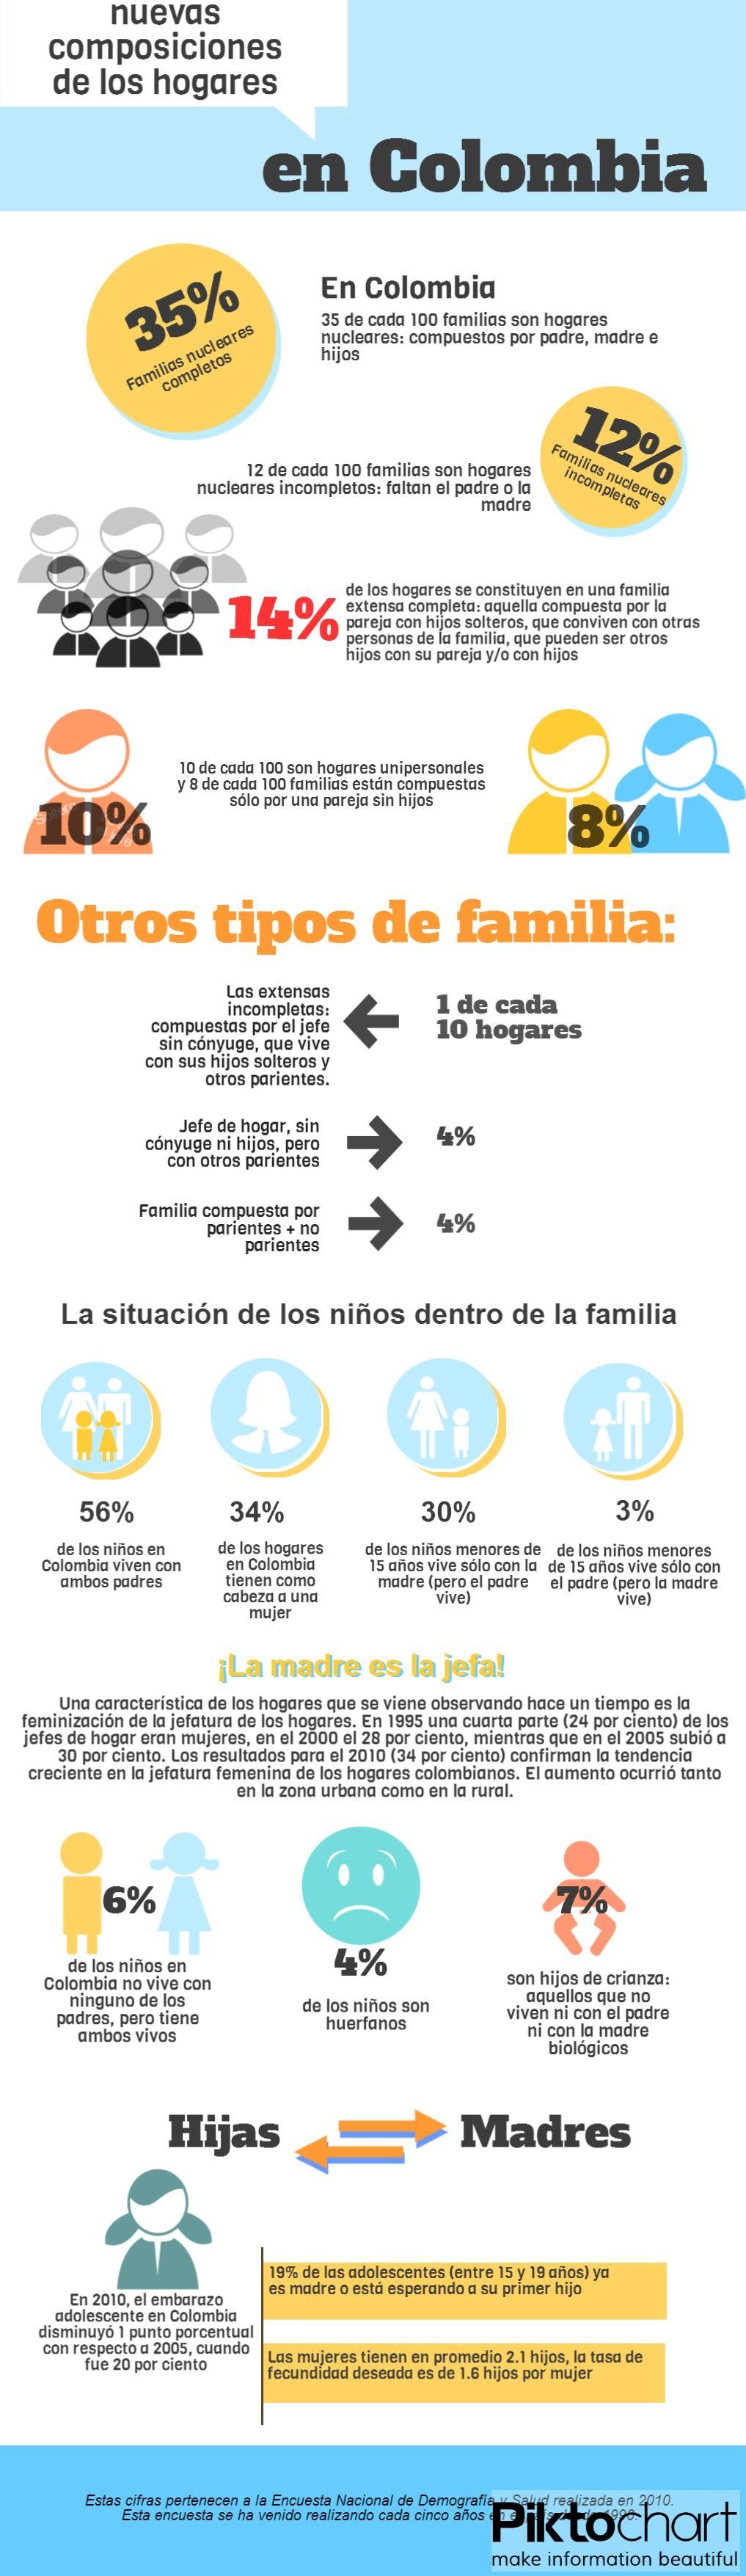 Familia Del Singular A La Diversidad Overused Words Educational Infographic Linkedin Marketing